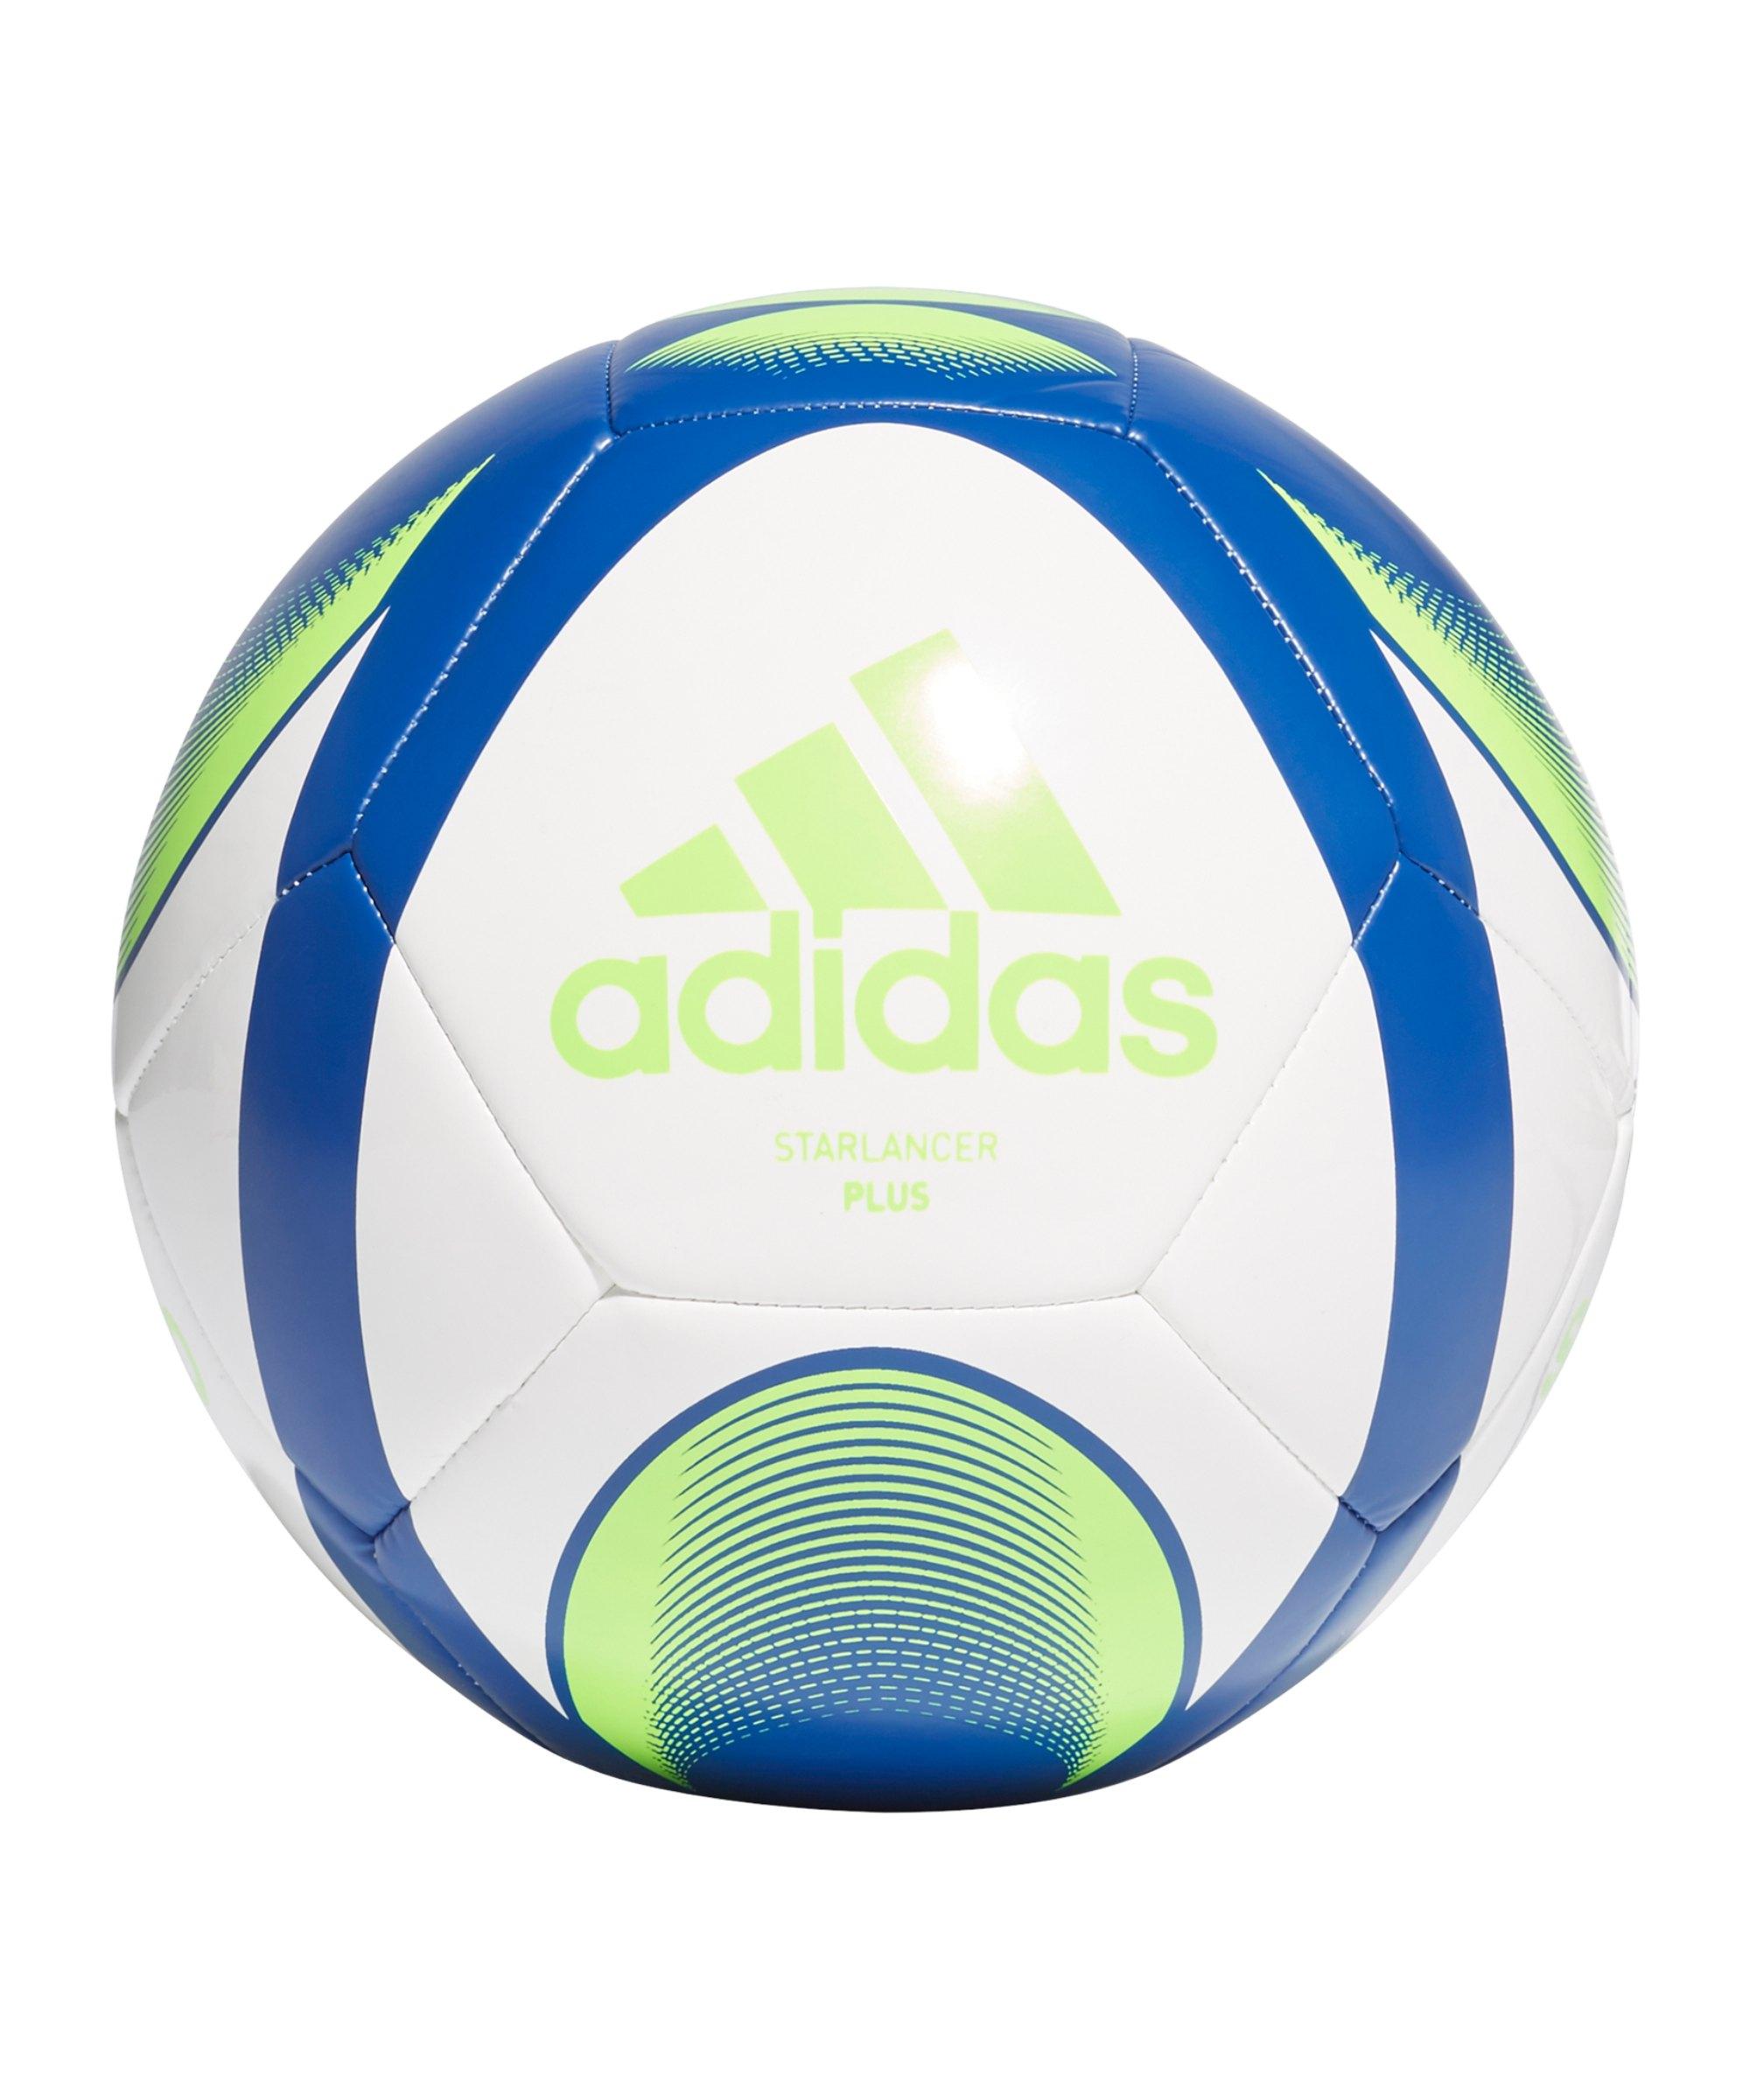 adidas Starlancer Plus Fussball Weiss Blau - weiss